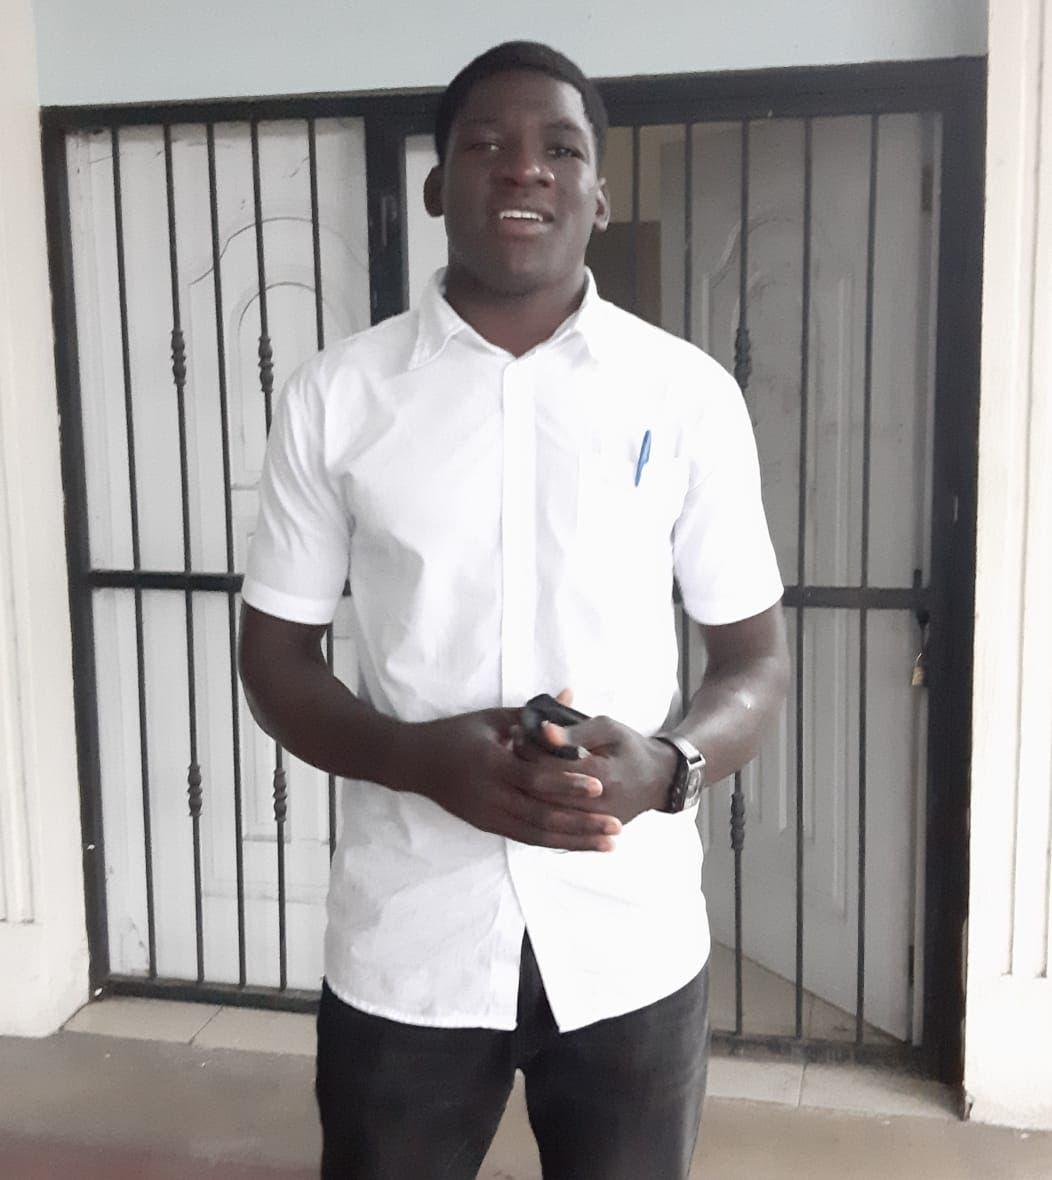 Joven deportista pide a JCE otorgue acta de nacimiento